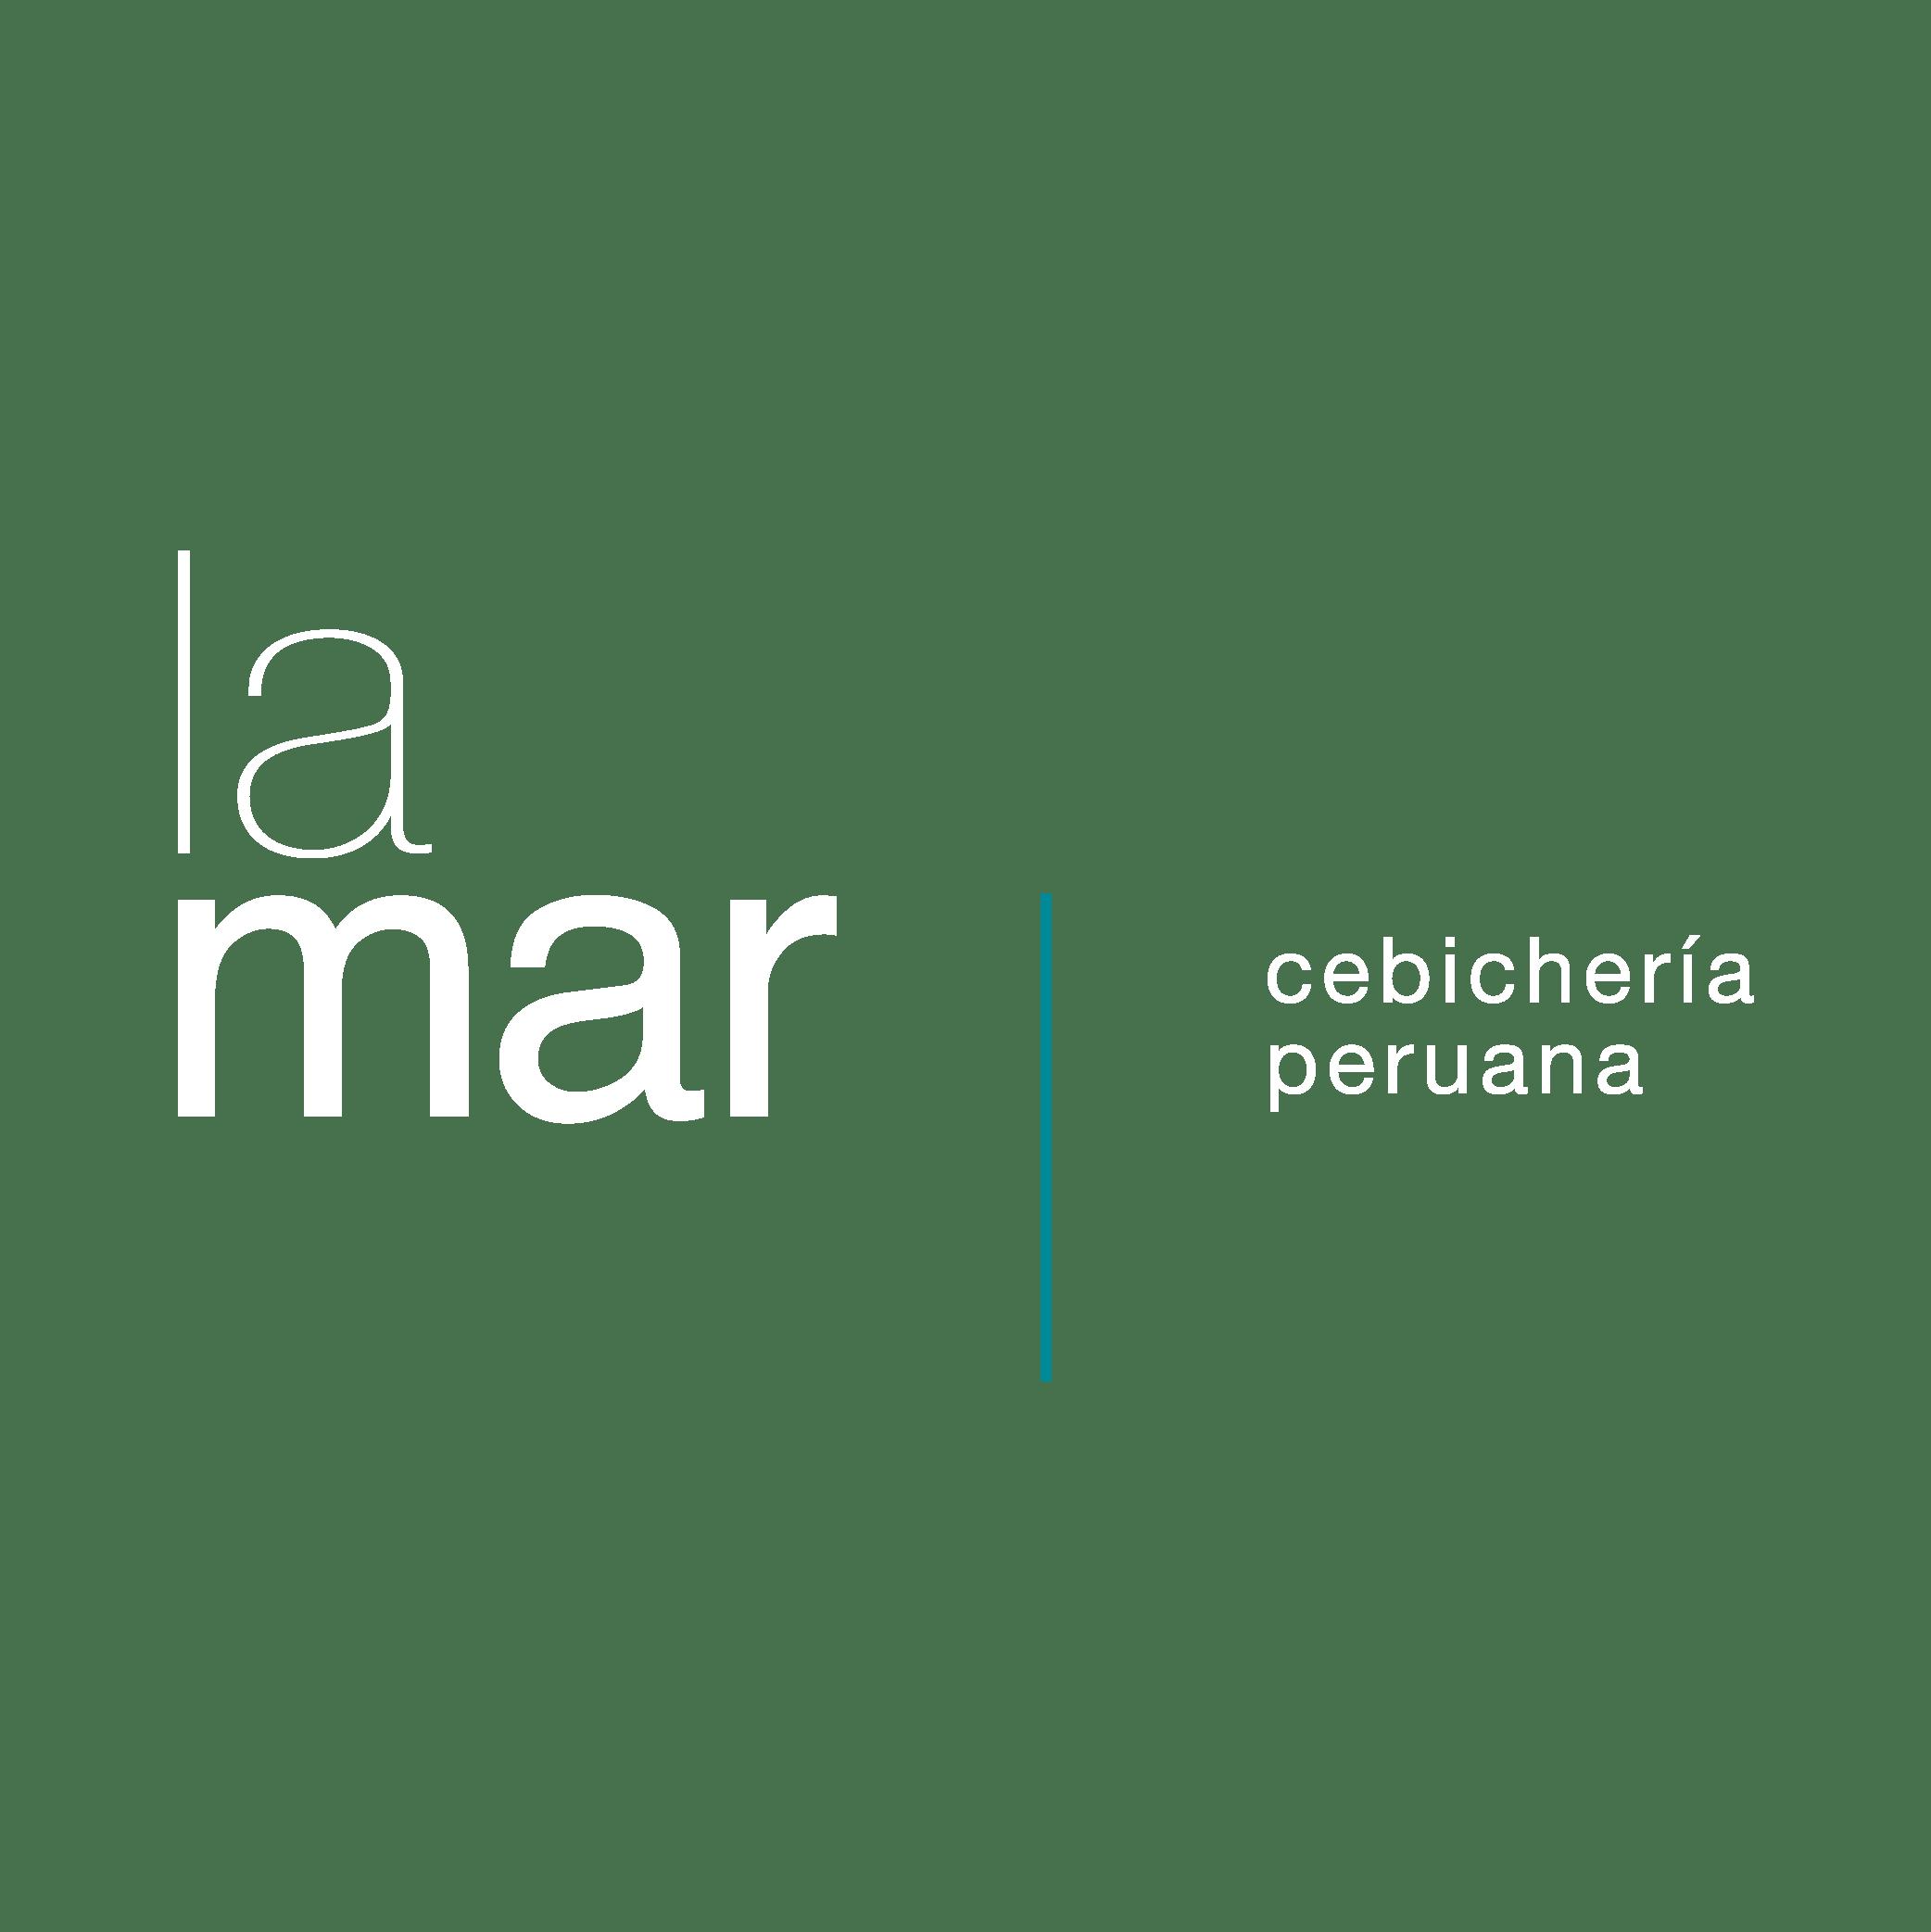 Logo_La Mar